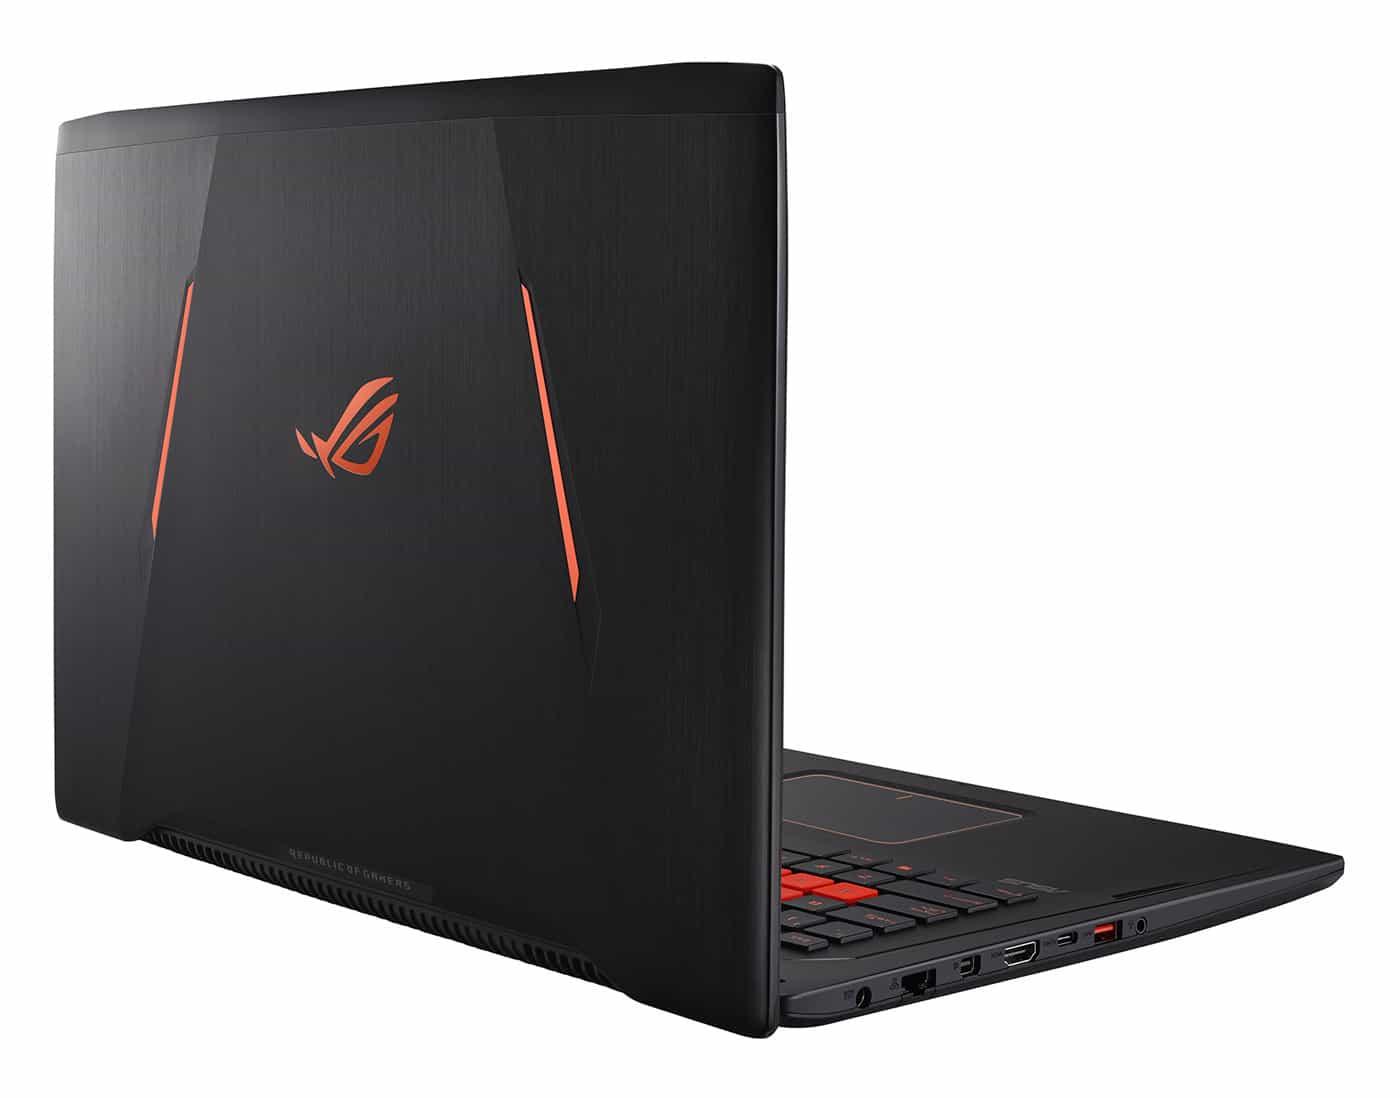 "<span class=""toptagtitre"">Promo 1199€ ! </span>Asus G702VM-GC002T, PC portable 17 pouces IPS GTX 1060"